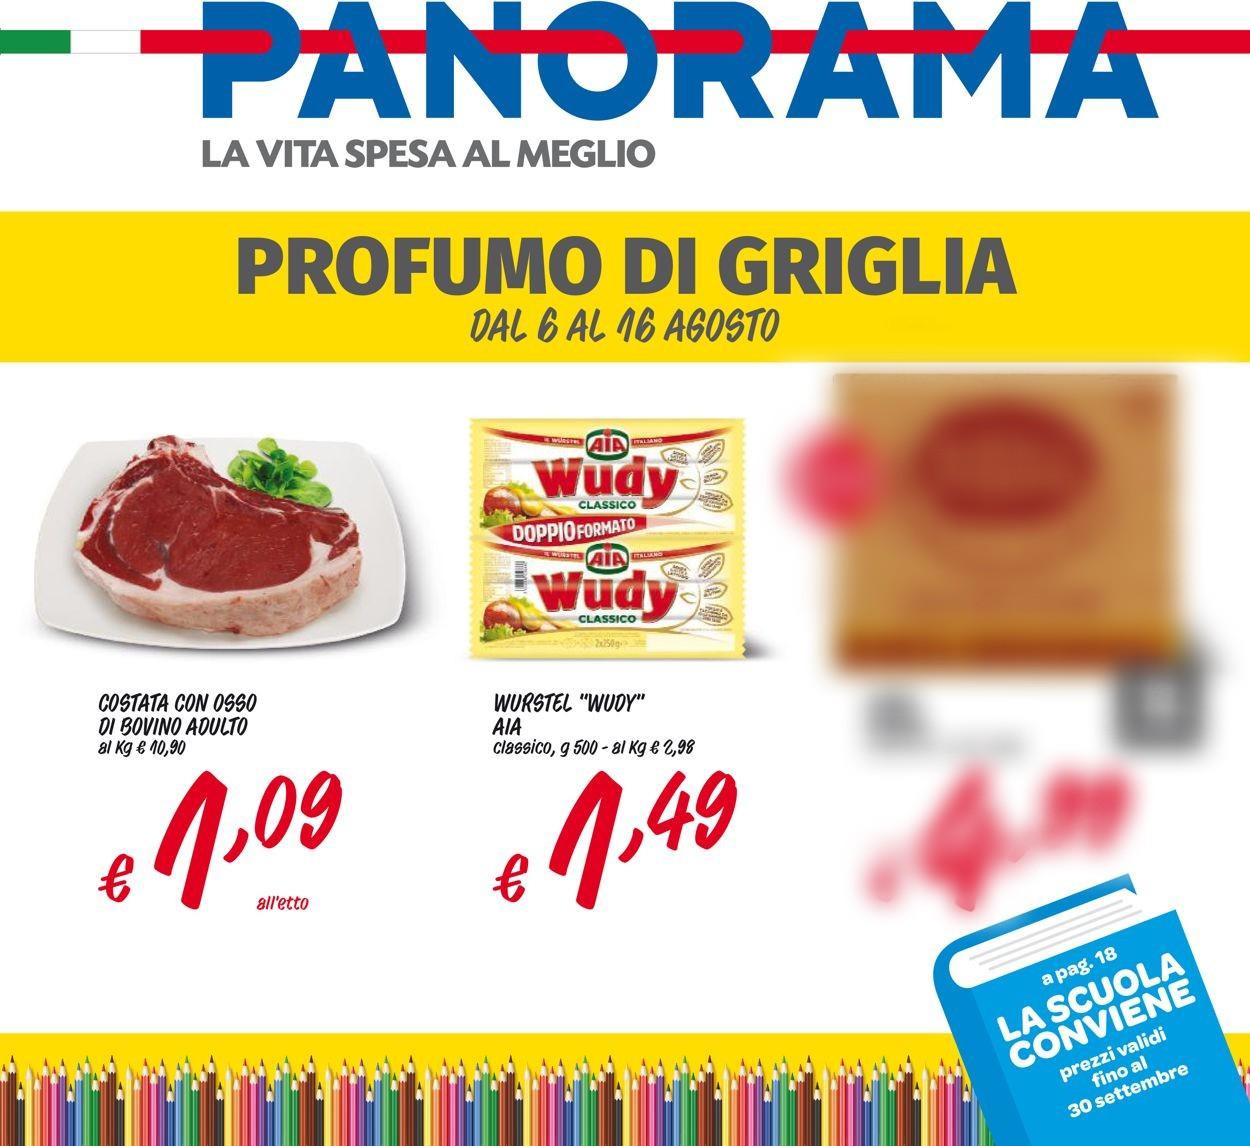 Volantino Pam Panorama - Offerte 06/08-16/08/2020